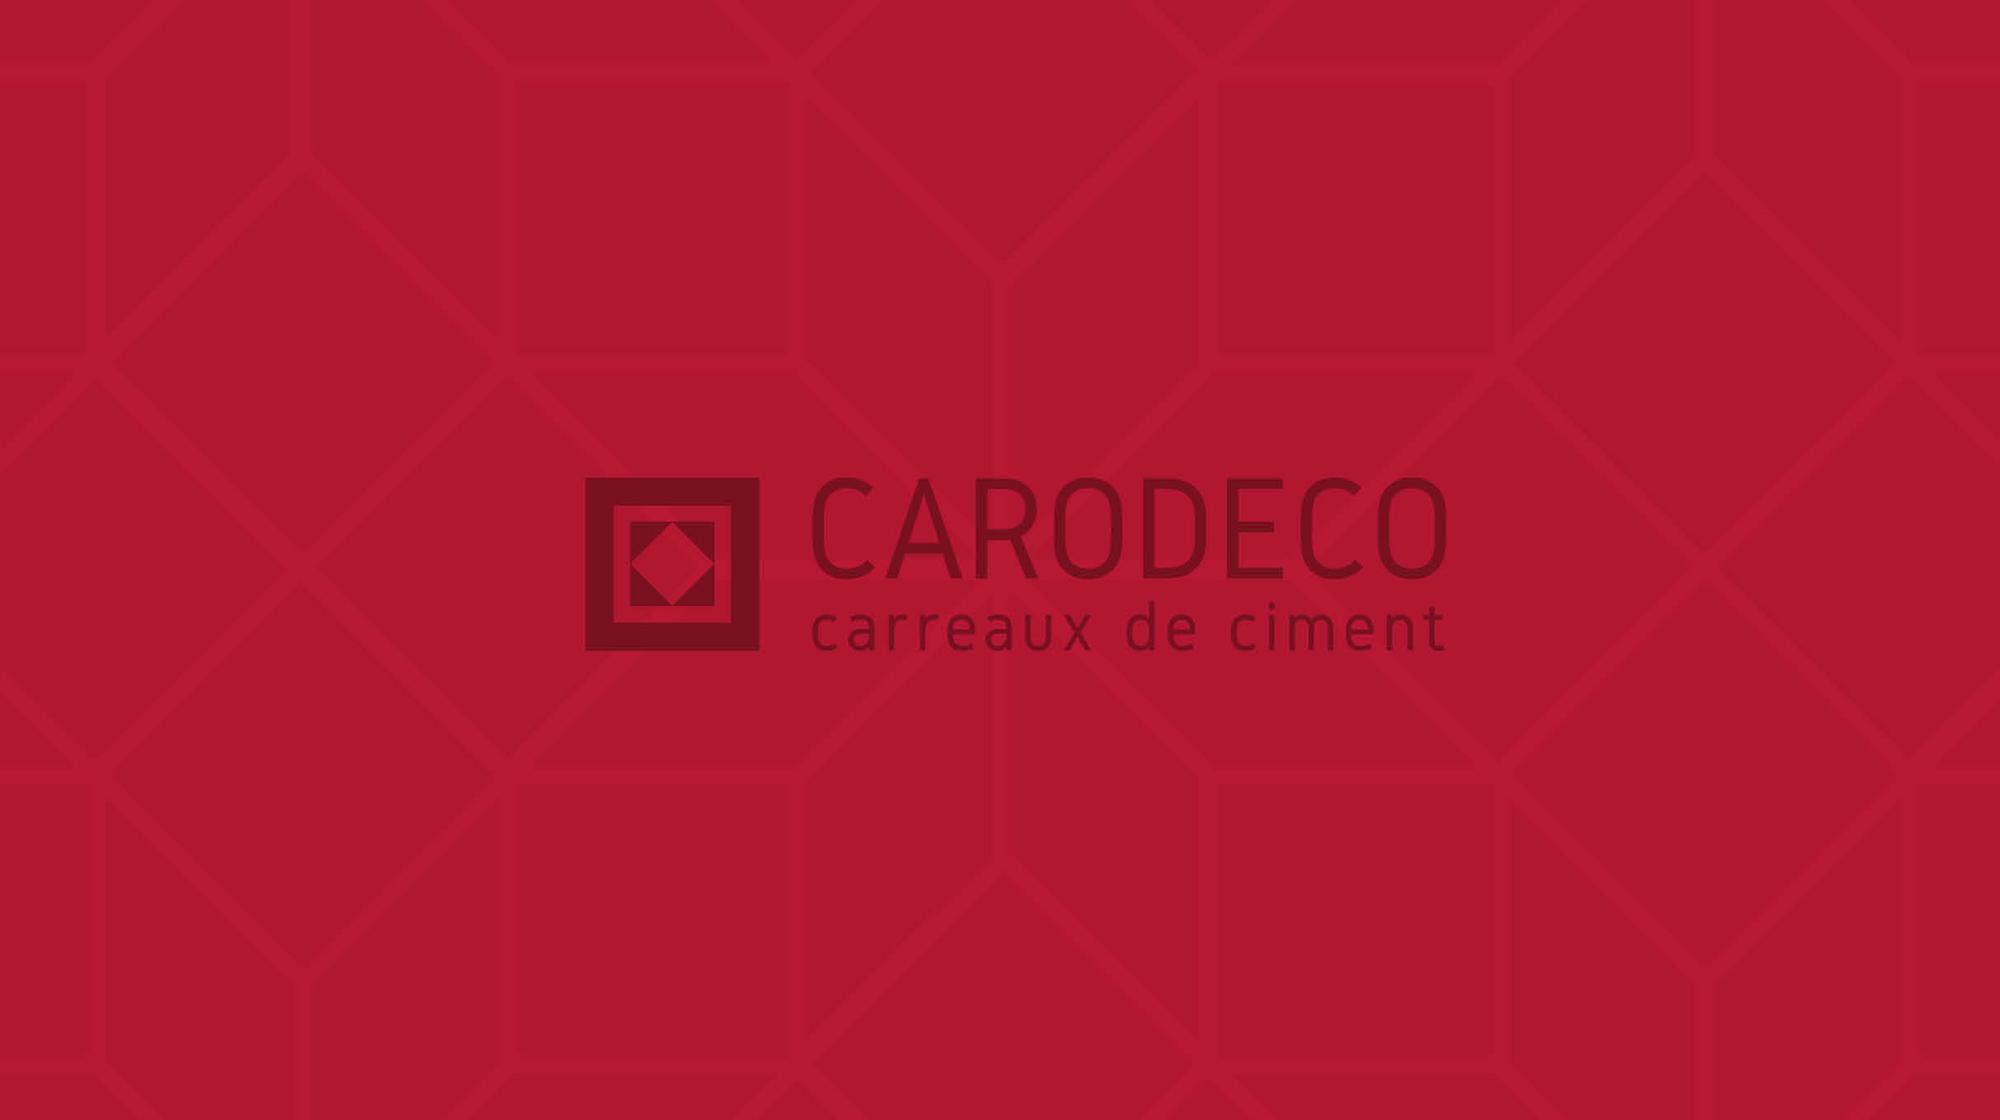 realisation-2-carodeco